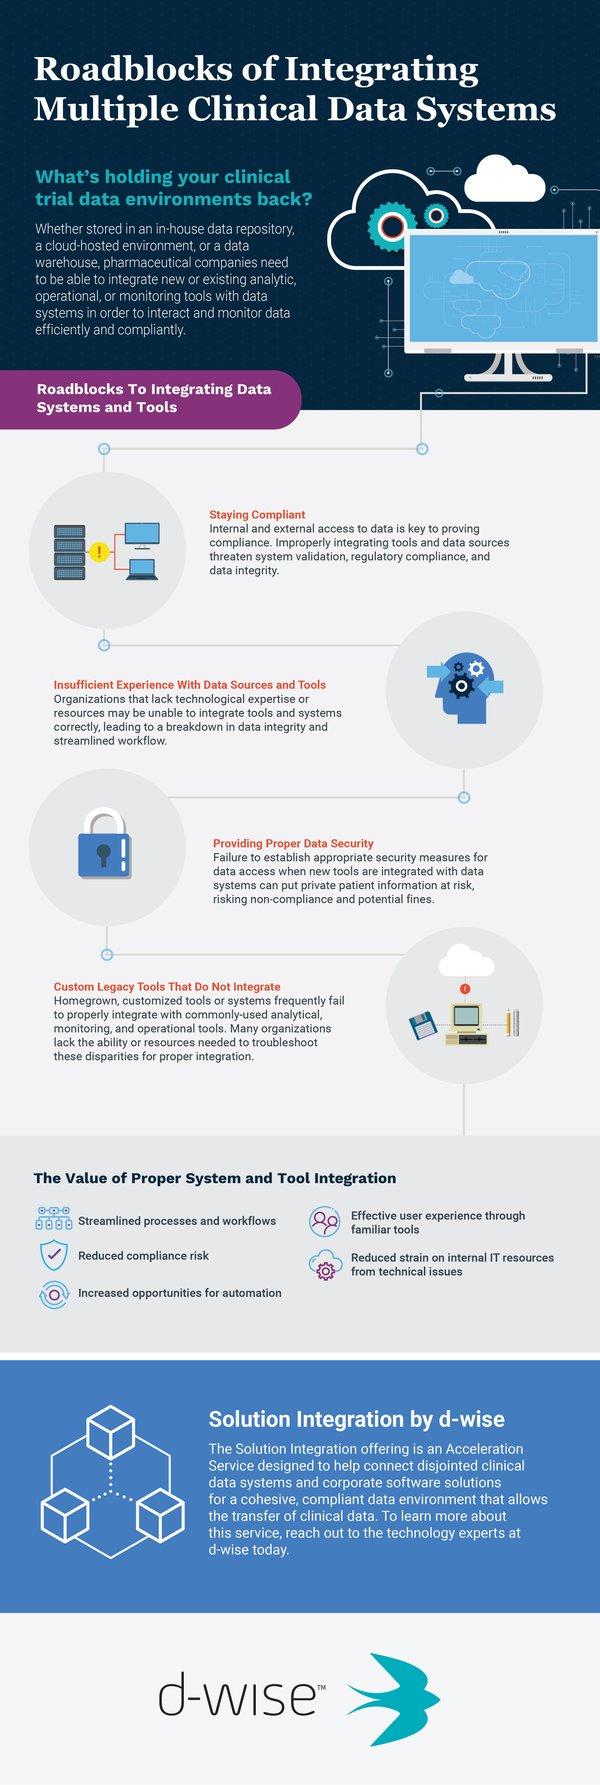 DWIS_Roadblocks-to-Integrating_Infographic_v2